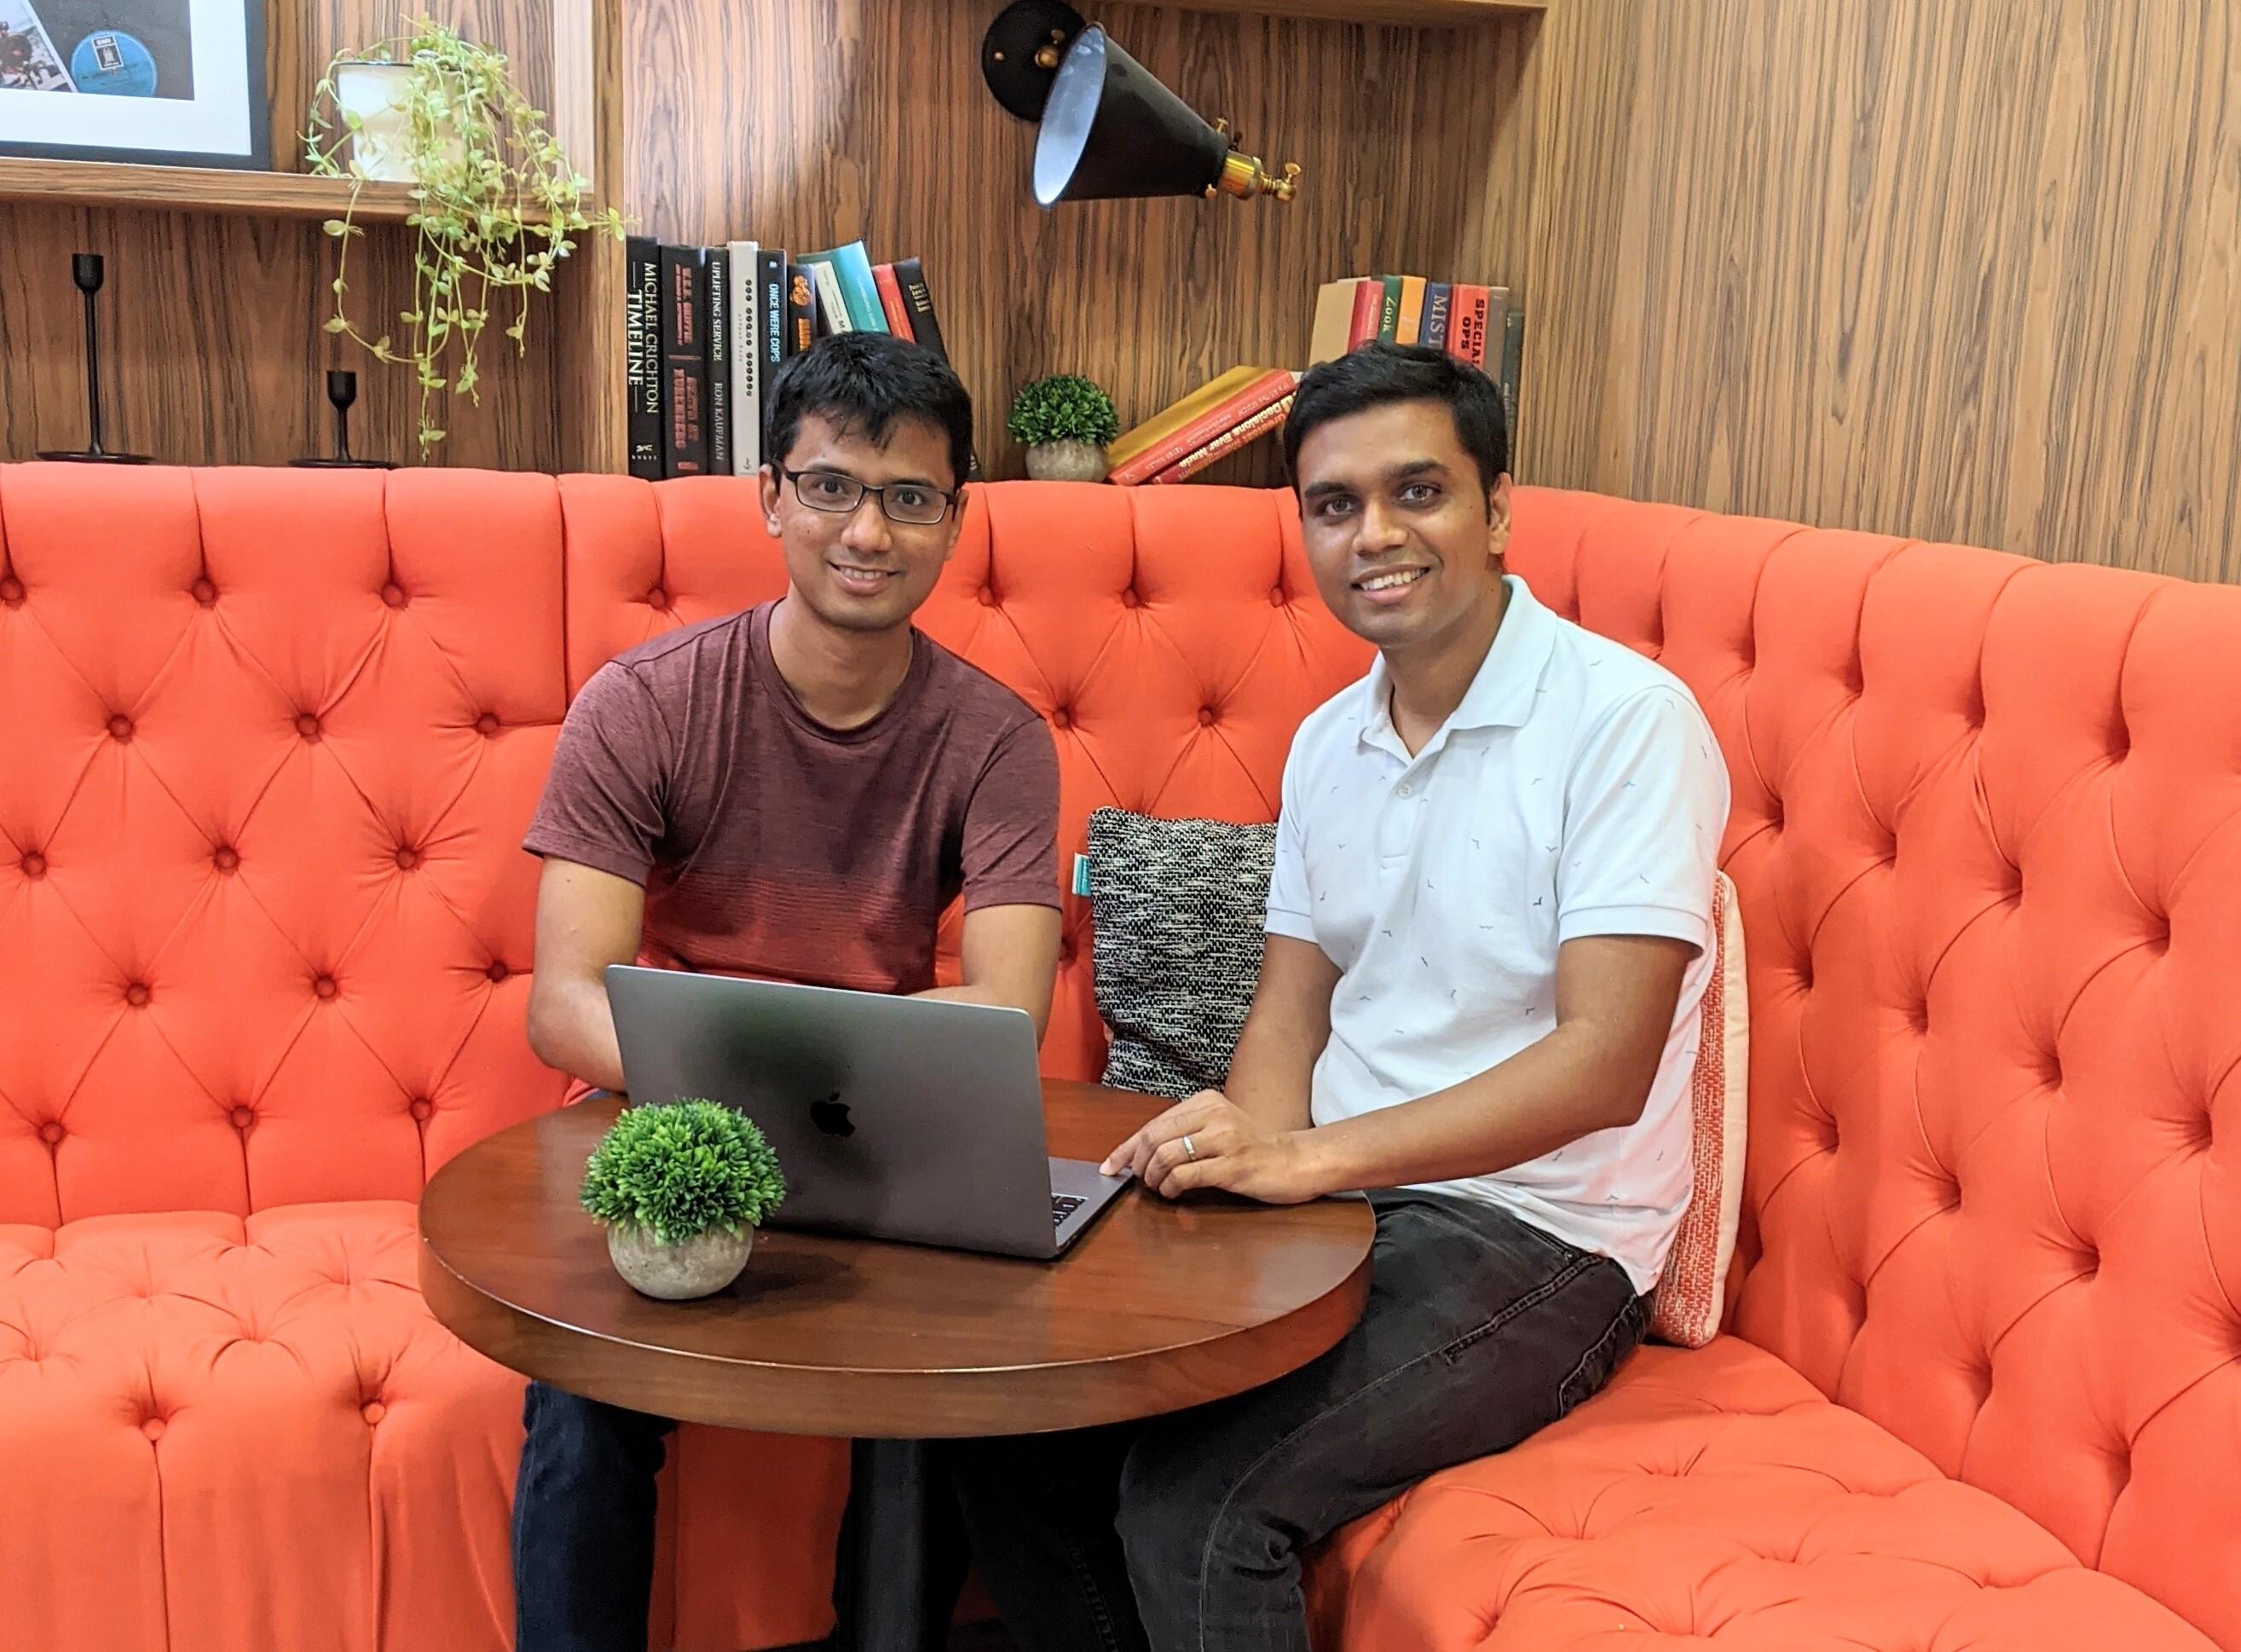 A photo of Nektar.ai founders Aravind Ravi Sulekha and Abhijeet Vijayvergiya